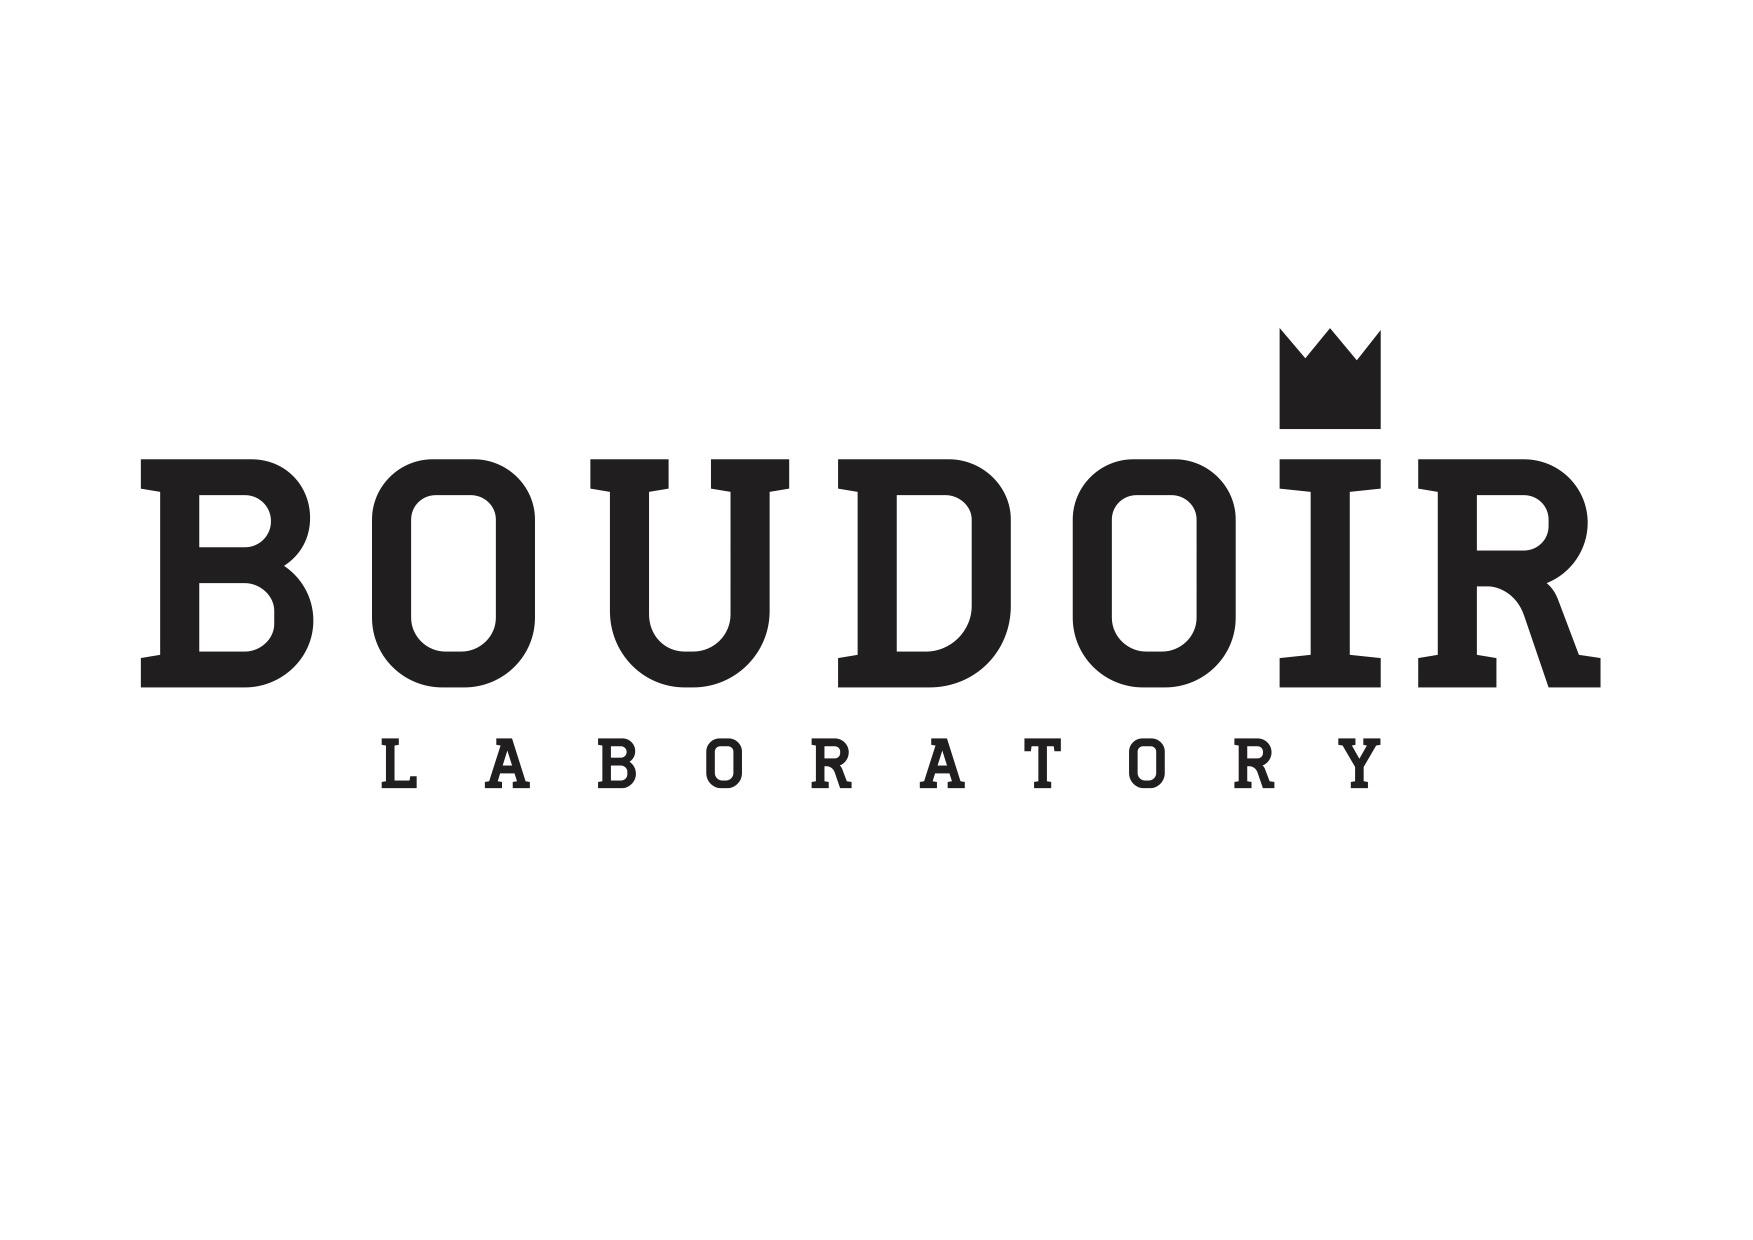 BOUDOIR logo final